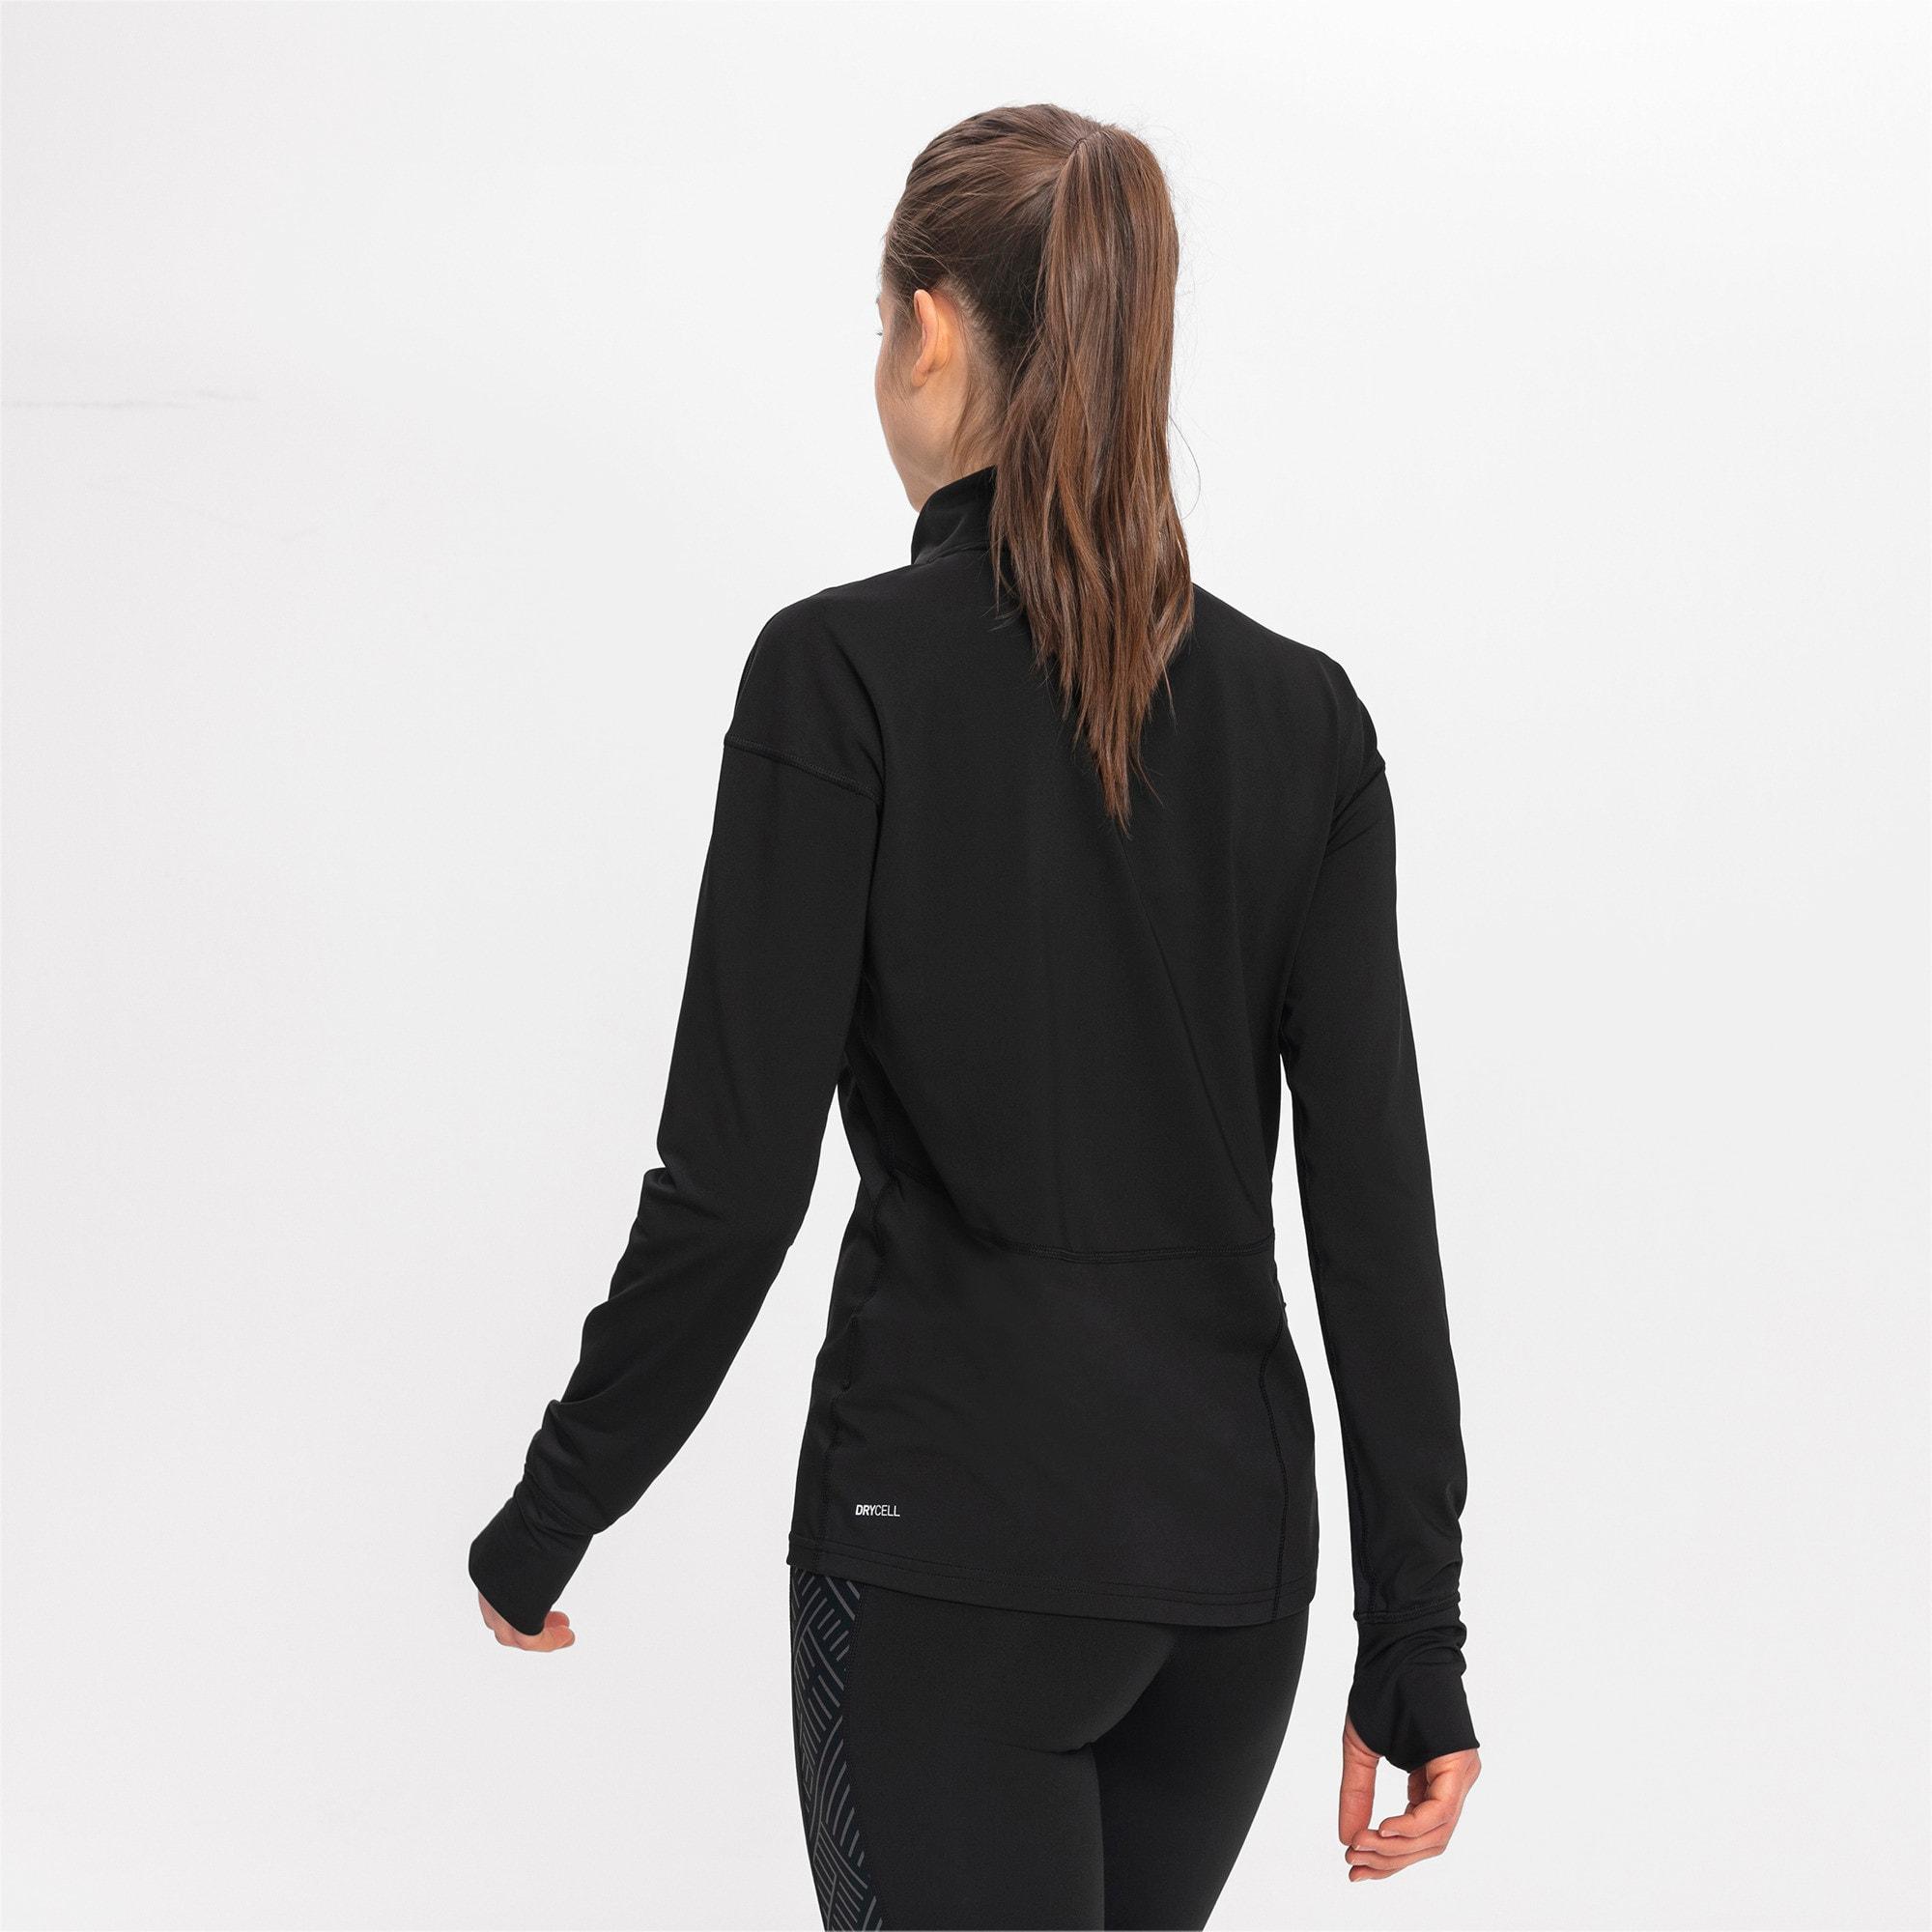 Thumbnail 2 of Ignite Long Sleeve Women's Running Pullover, Puma Black, medium